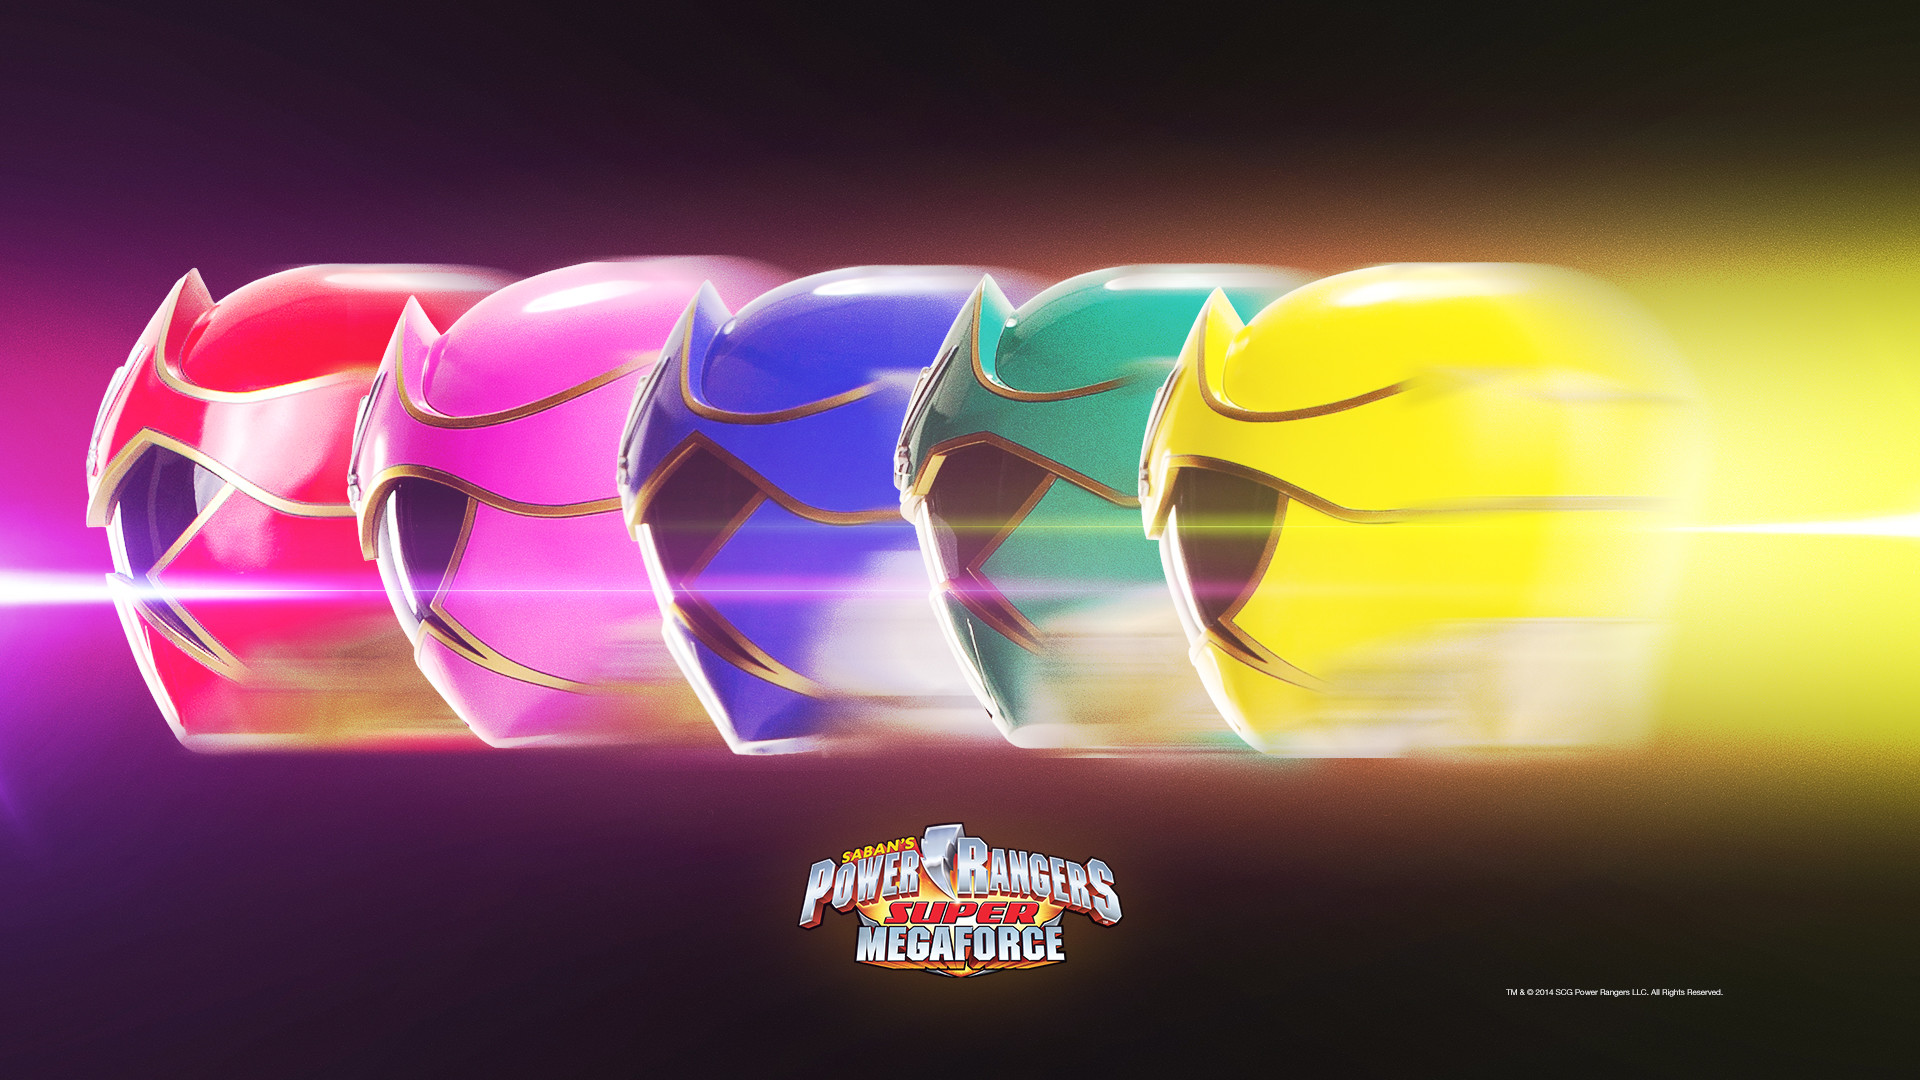 Power Rangers Wallpaper: Super Megaforce Streak  Desktop .